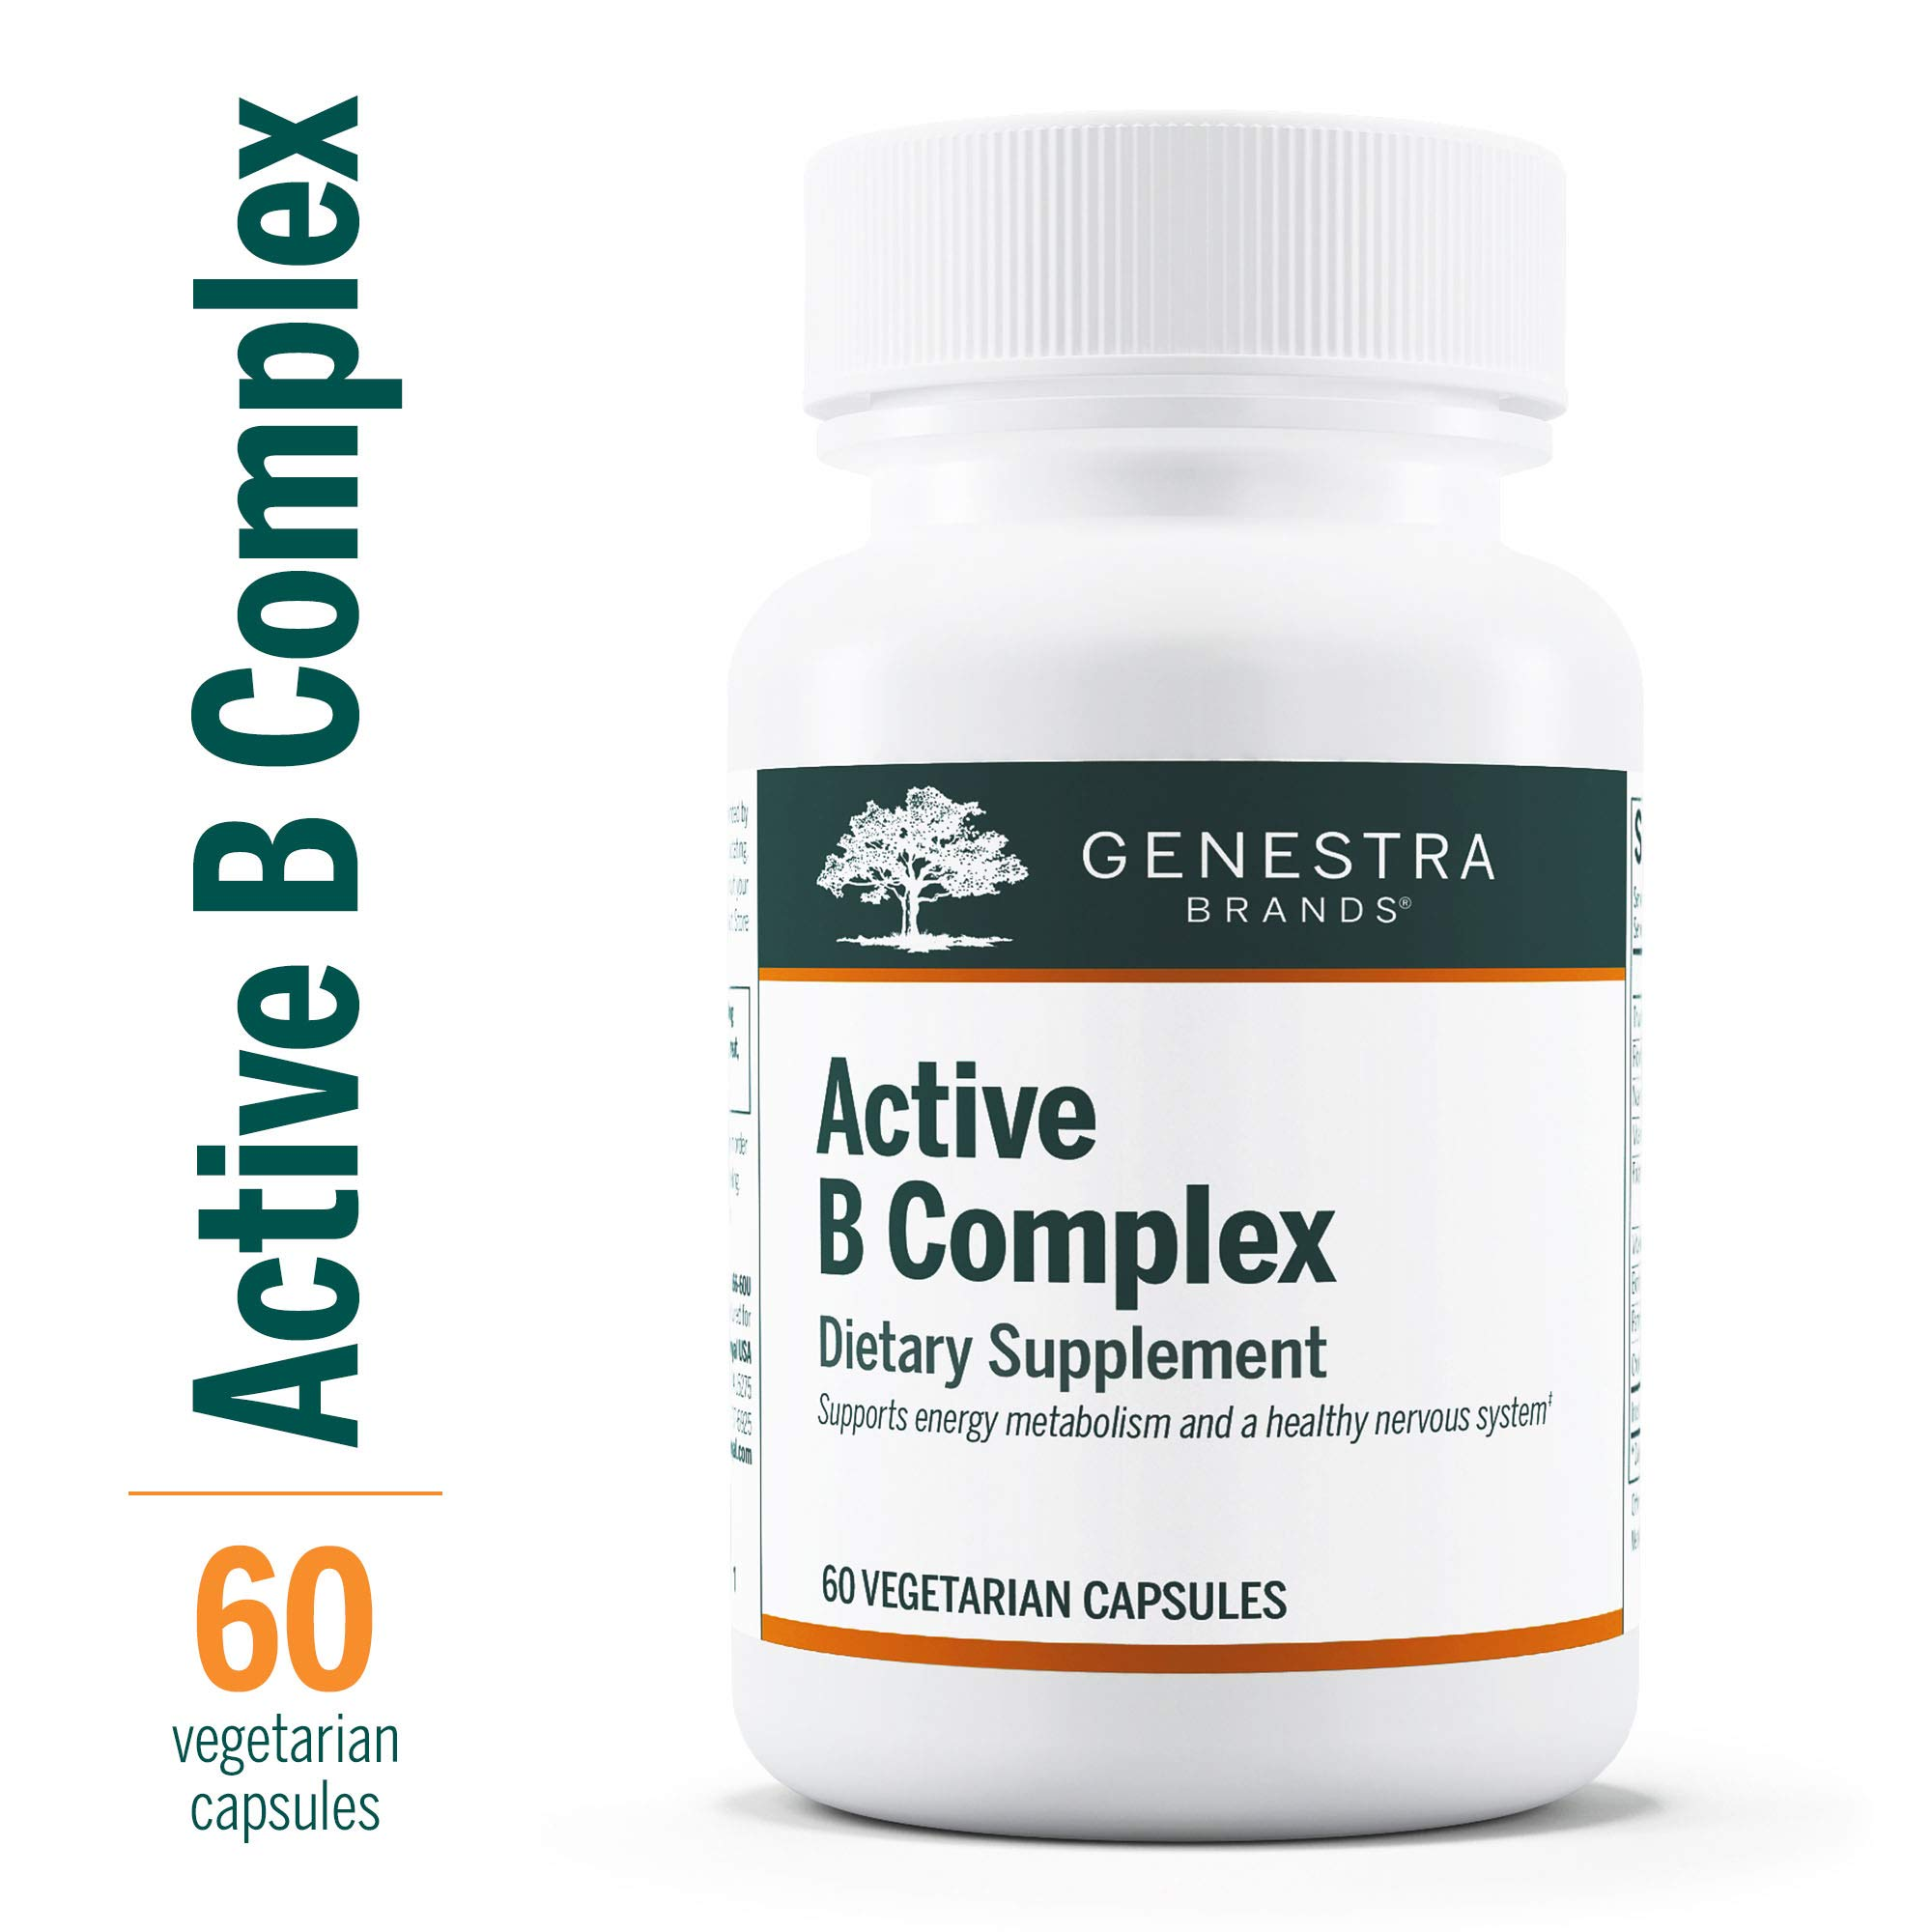 Genestra Brands - Active B Complex - Complete B Vitamin Complex Supplement - 60 Vegetable Capsules